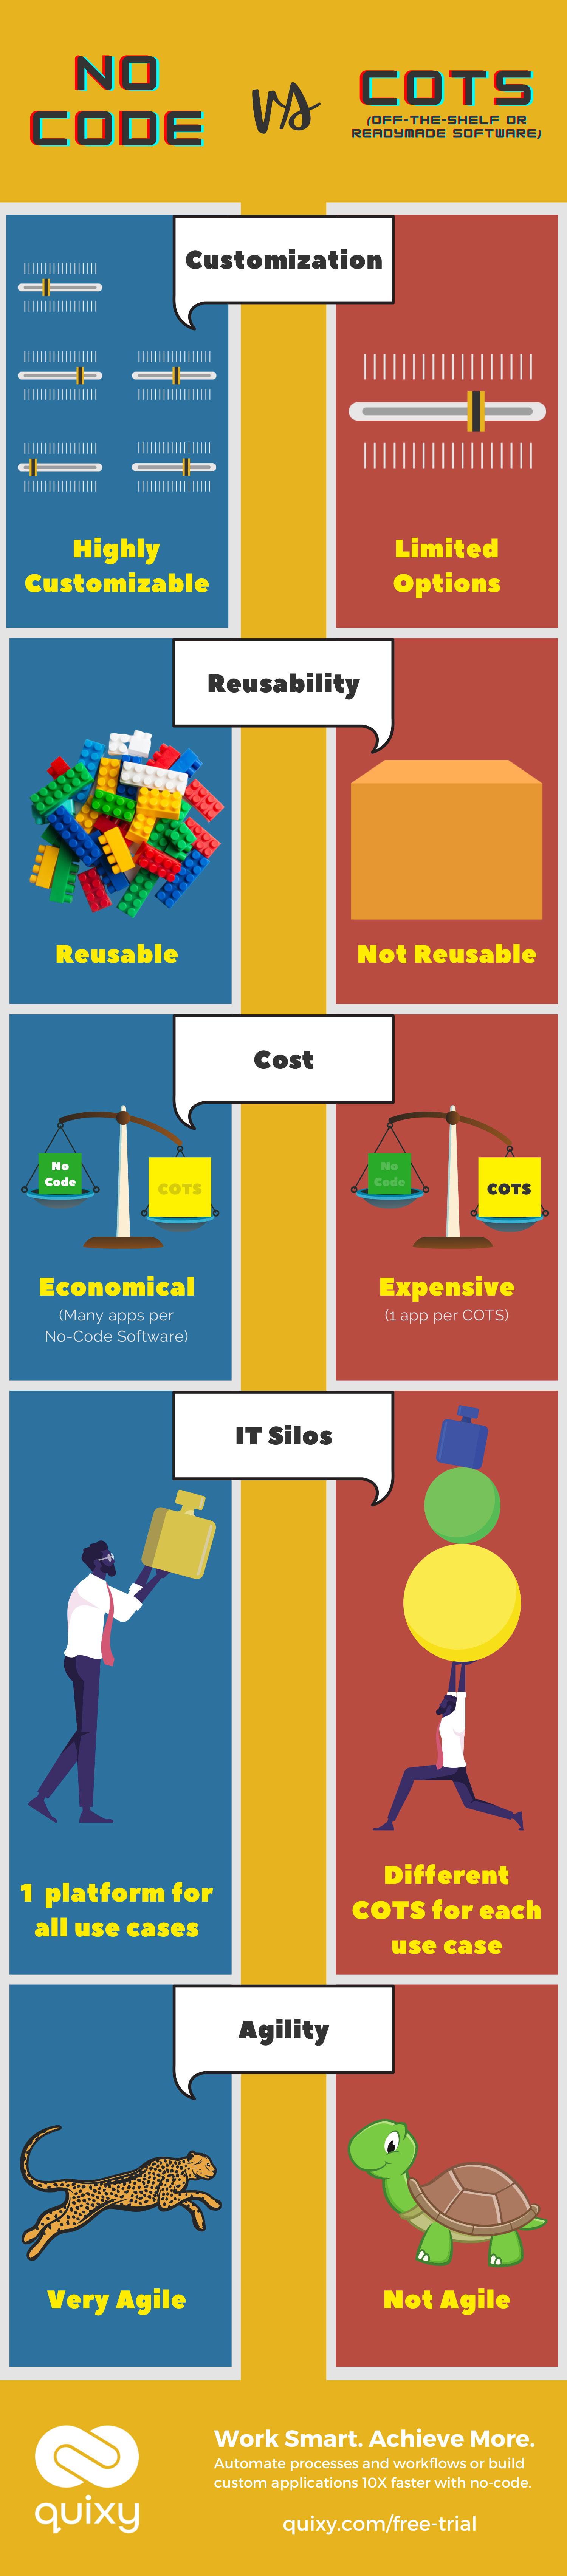 No-Code vs COTS Infographic